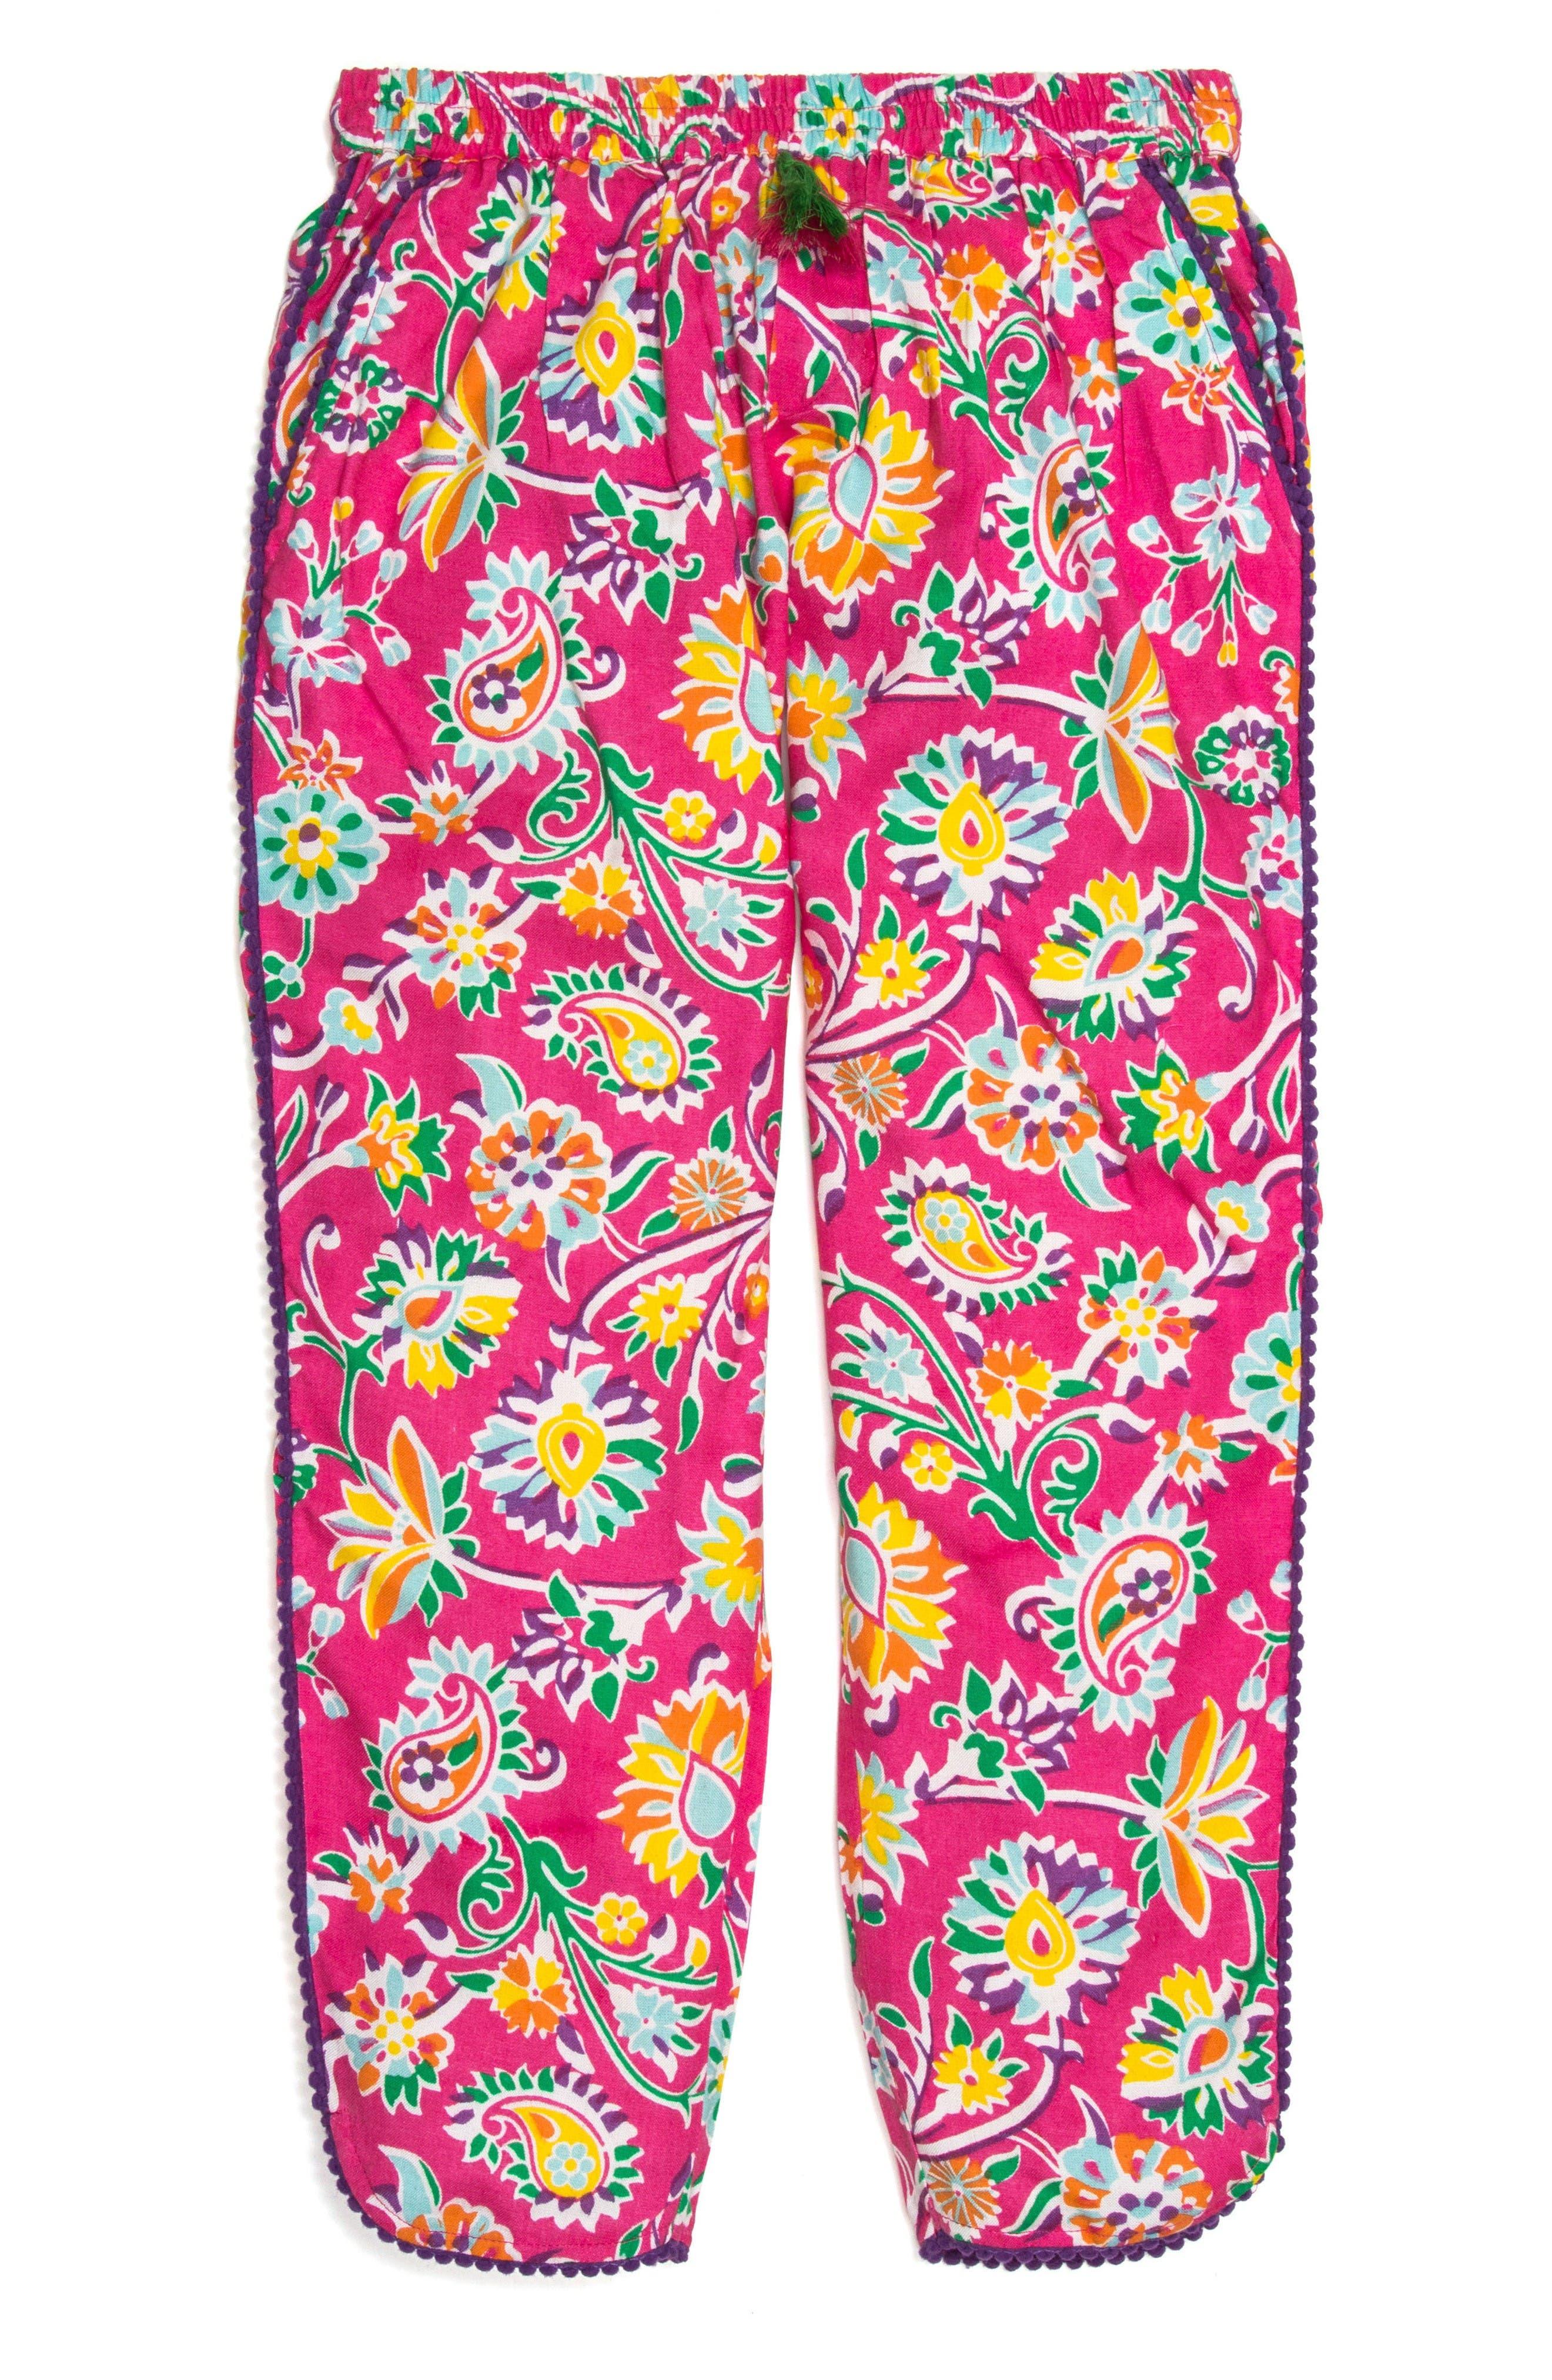 Alternate Image 1 Selected - Masalababy Boondi Floral Print Pants (Toddler Girls, Little Girls & Big Girls)